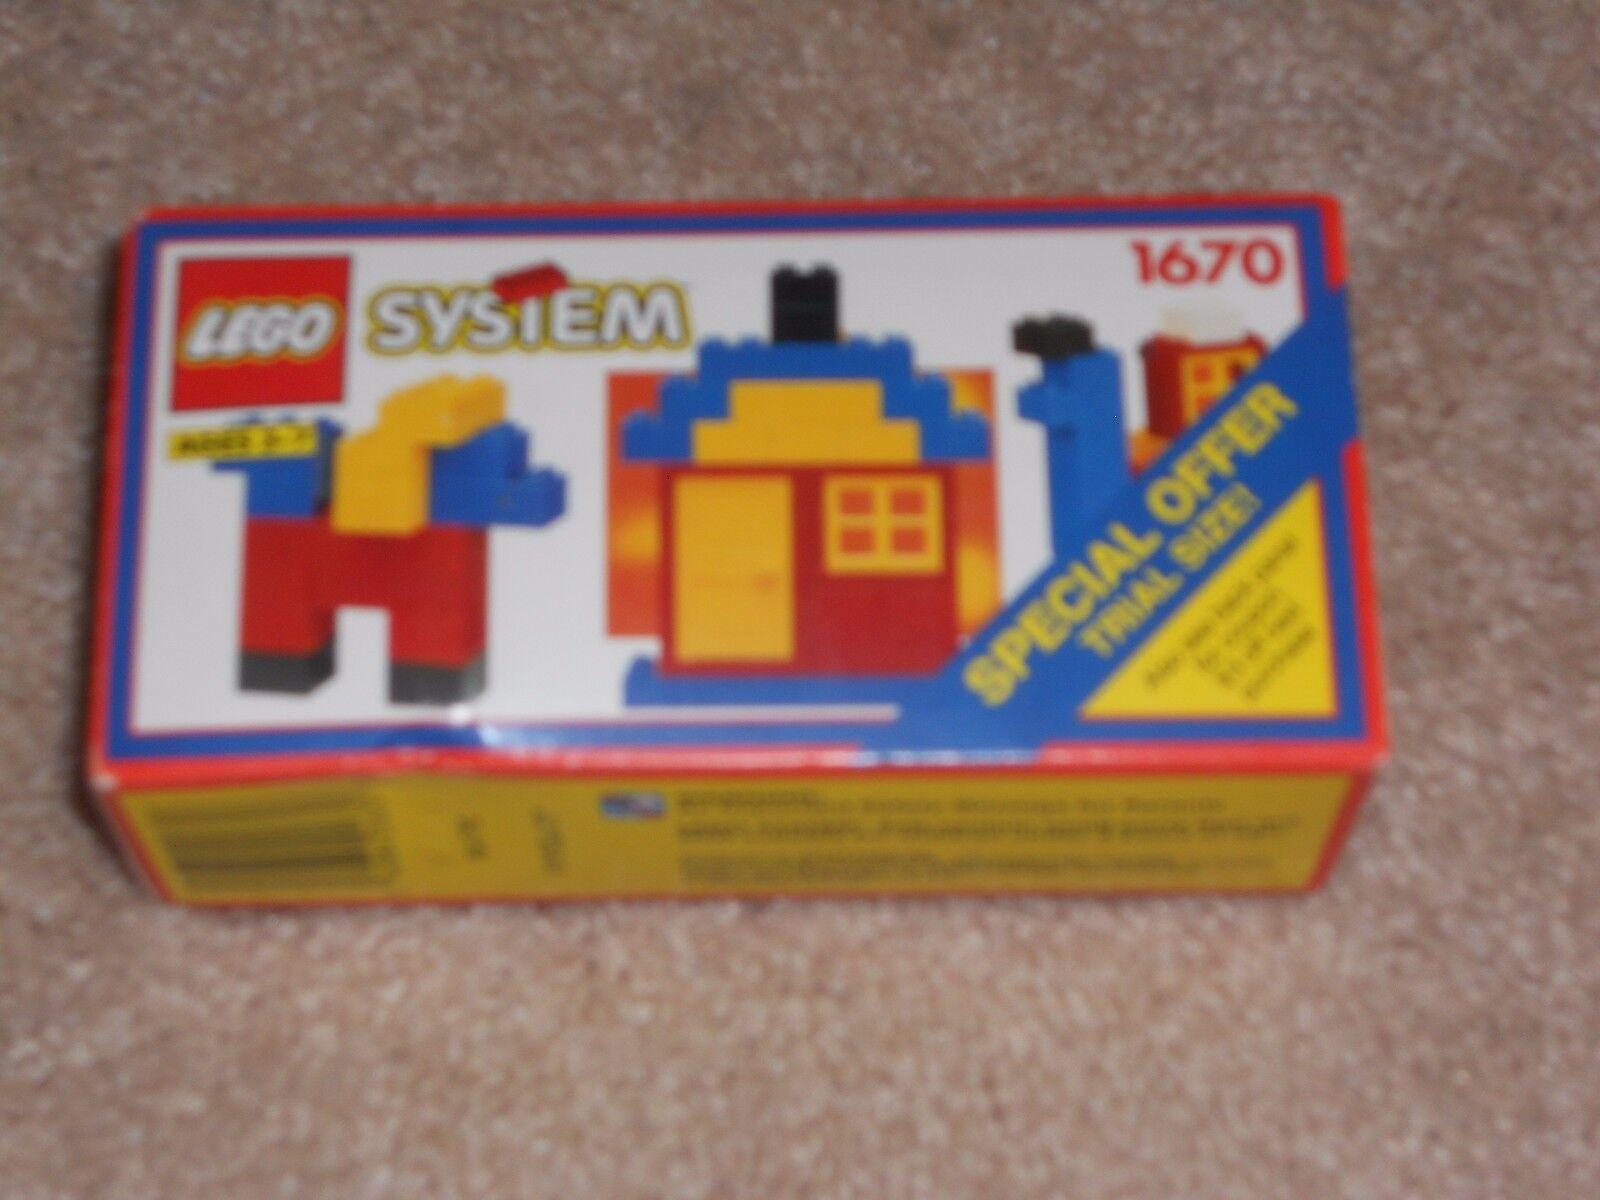 NEW LEGO SYSTEM Vintage set set set 1992 NIB 09ed71